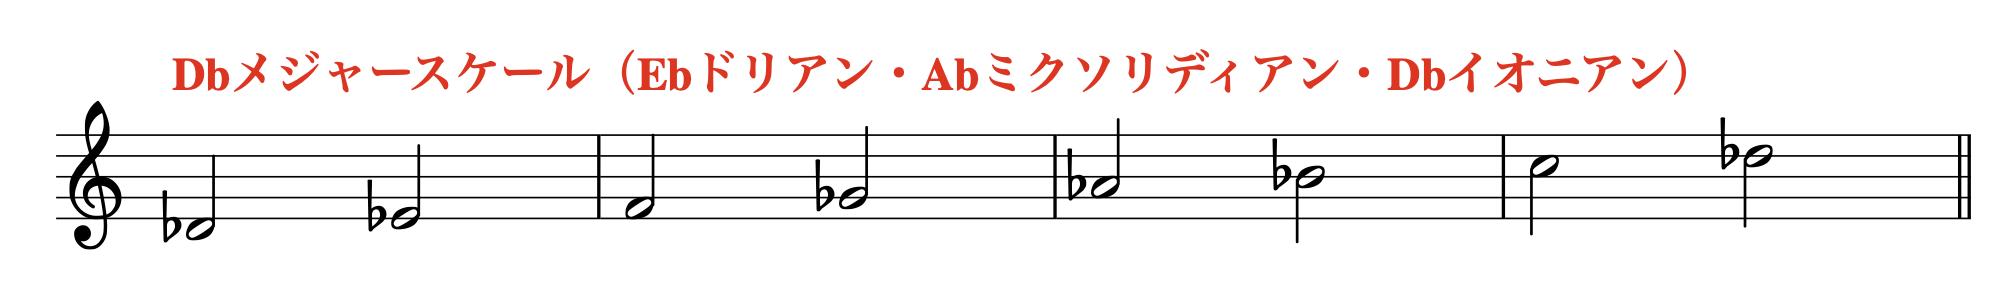 db-majorscale